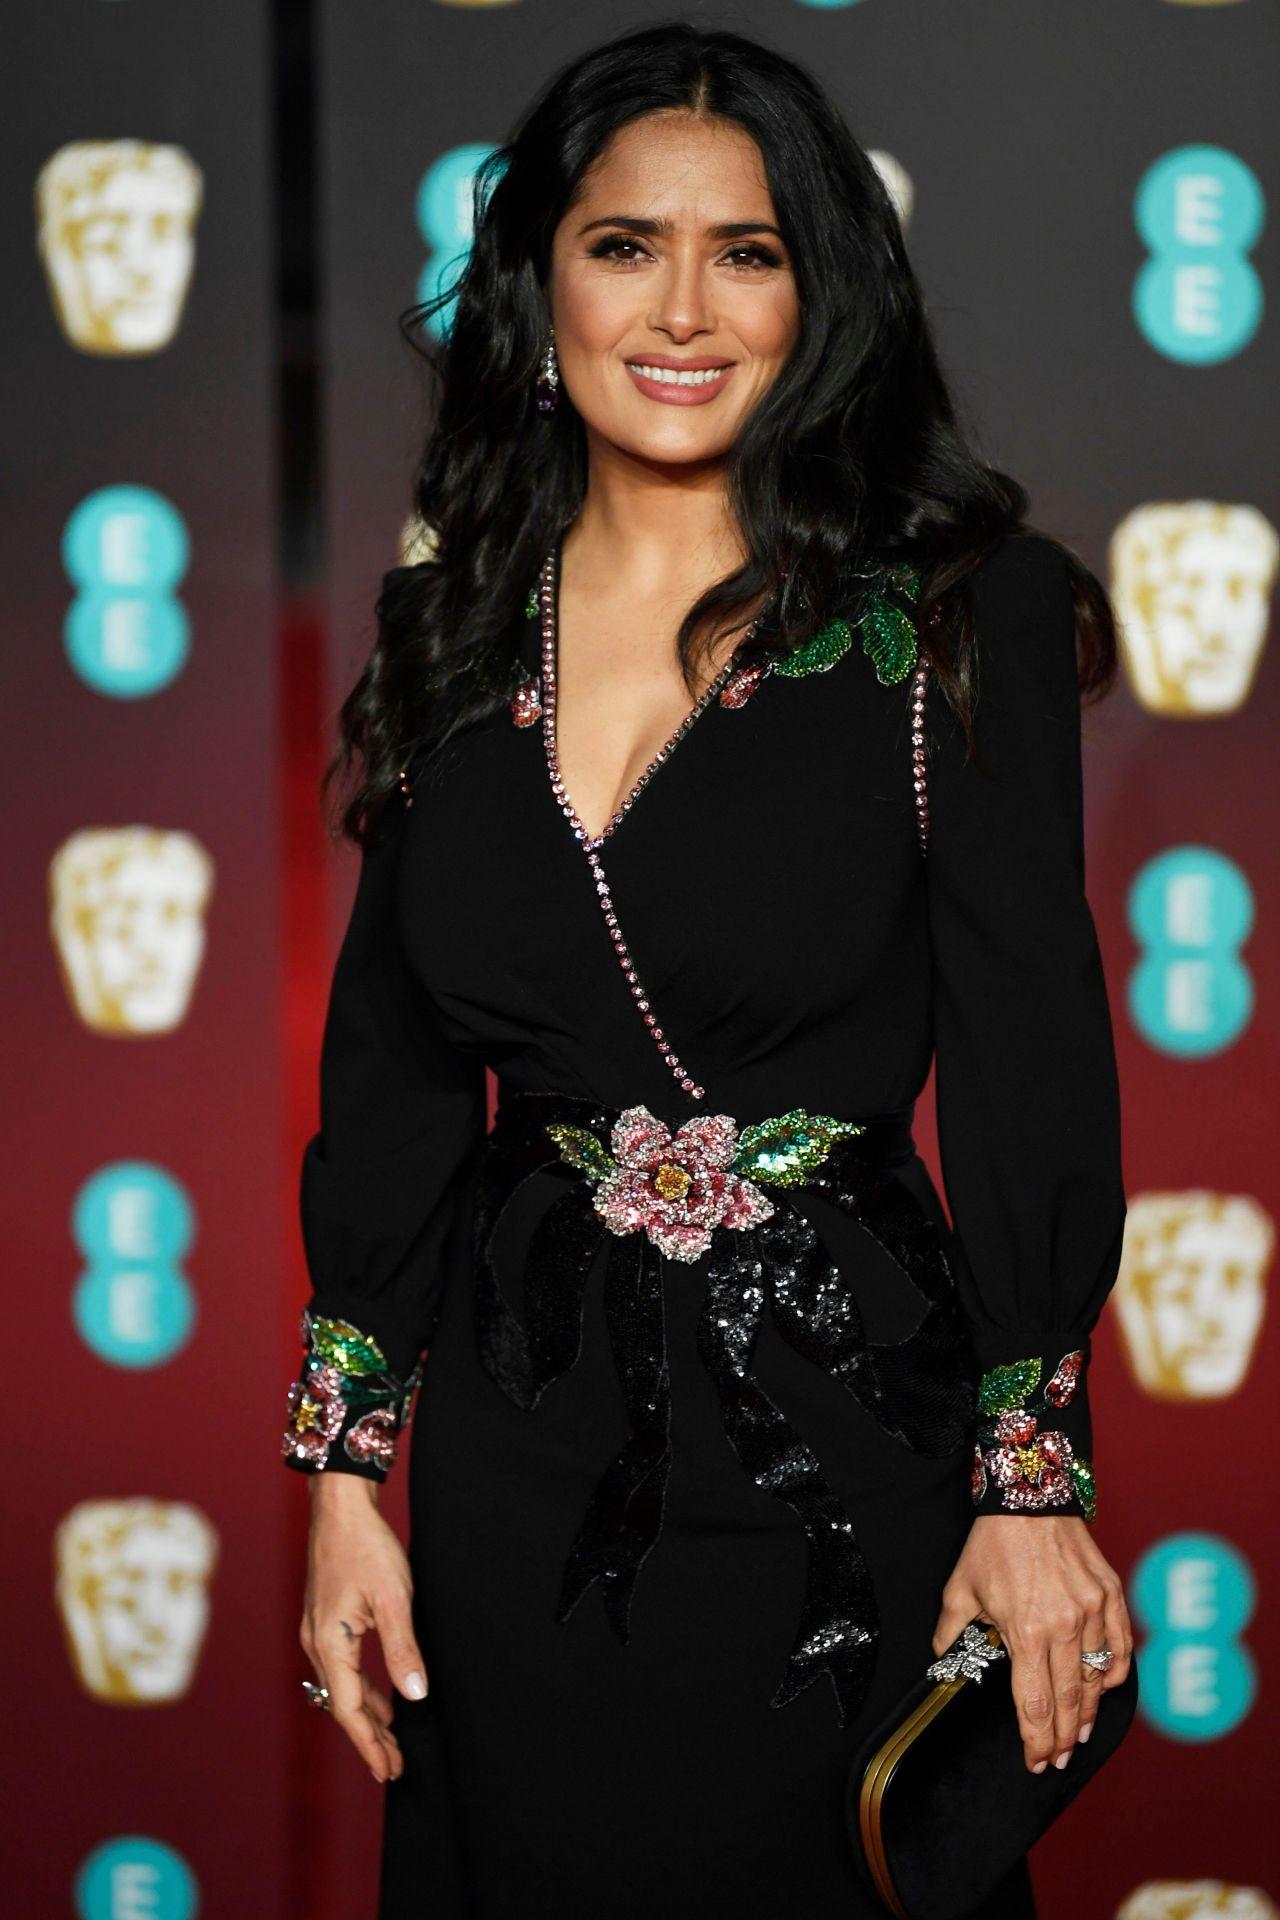 http://celebmafia.com/wp-content/uploads/2018/02/salma-hayek-2018-british-academy-film-awards-5.jpg